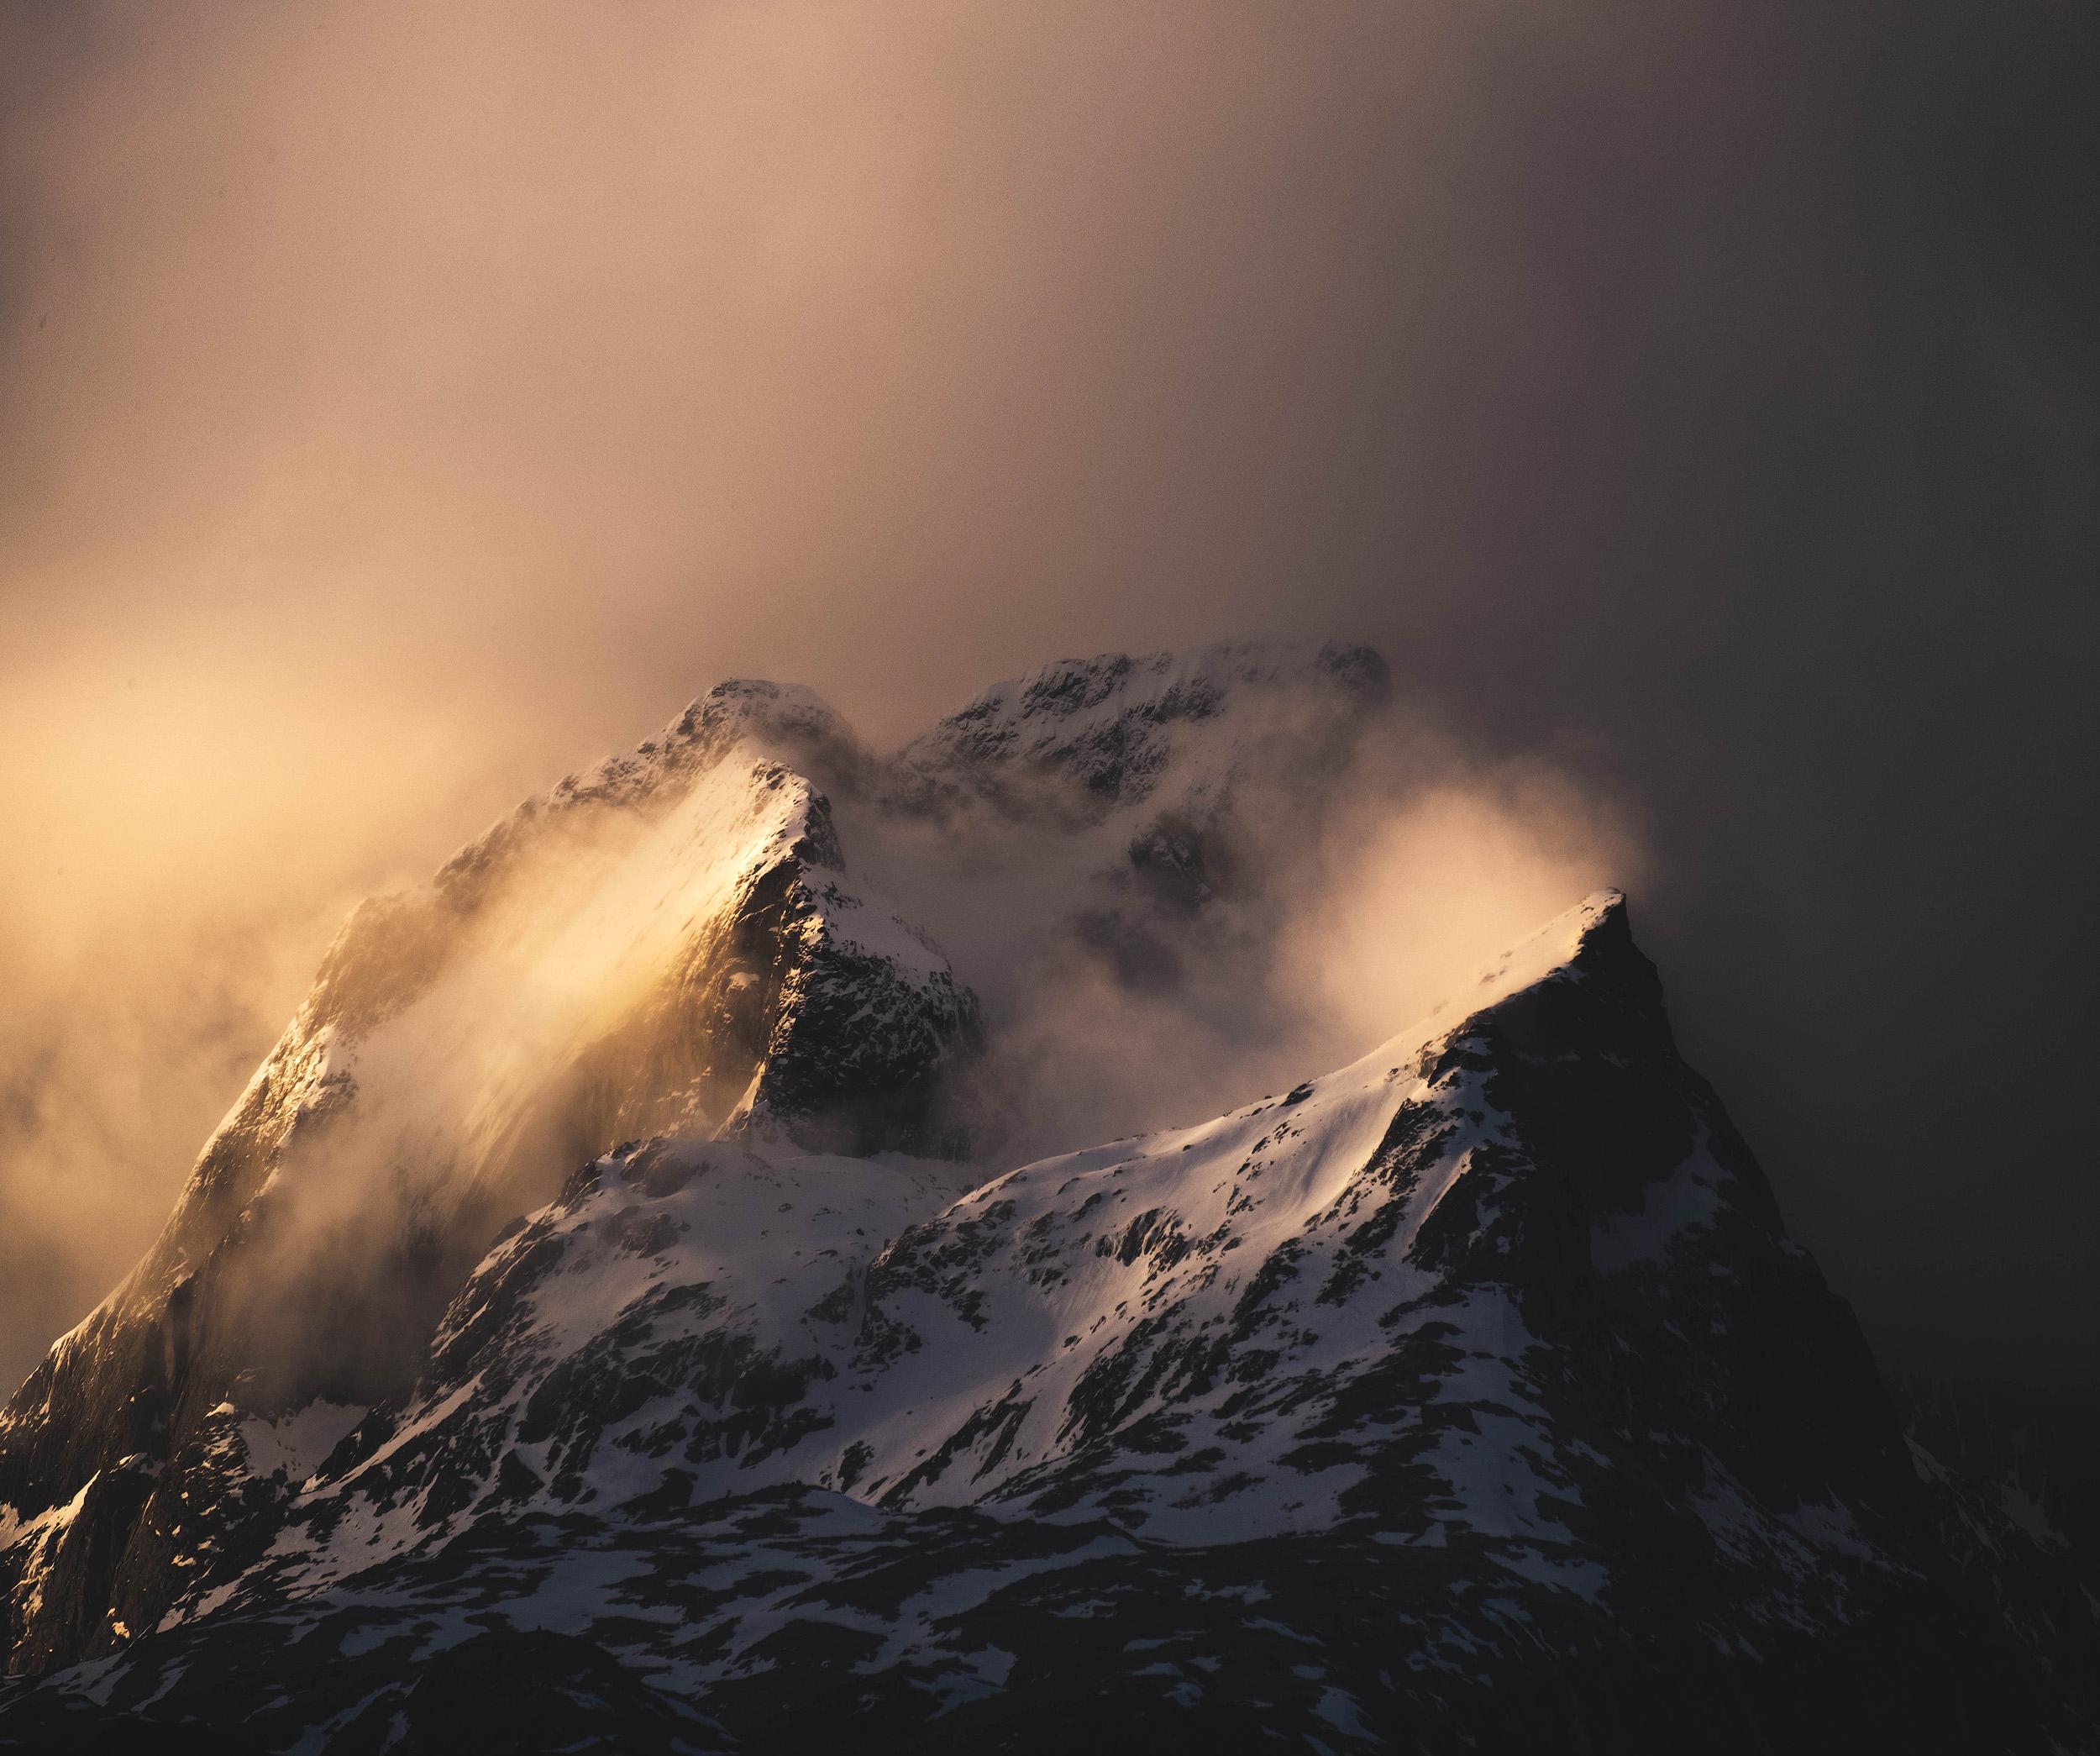 Mountain Light   Dynamic light at sunrise paints the peaks golden in the Lofoten Islands